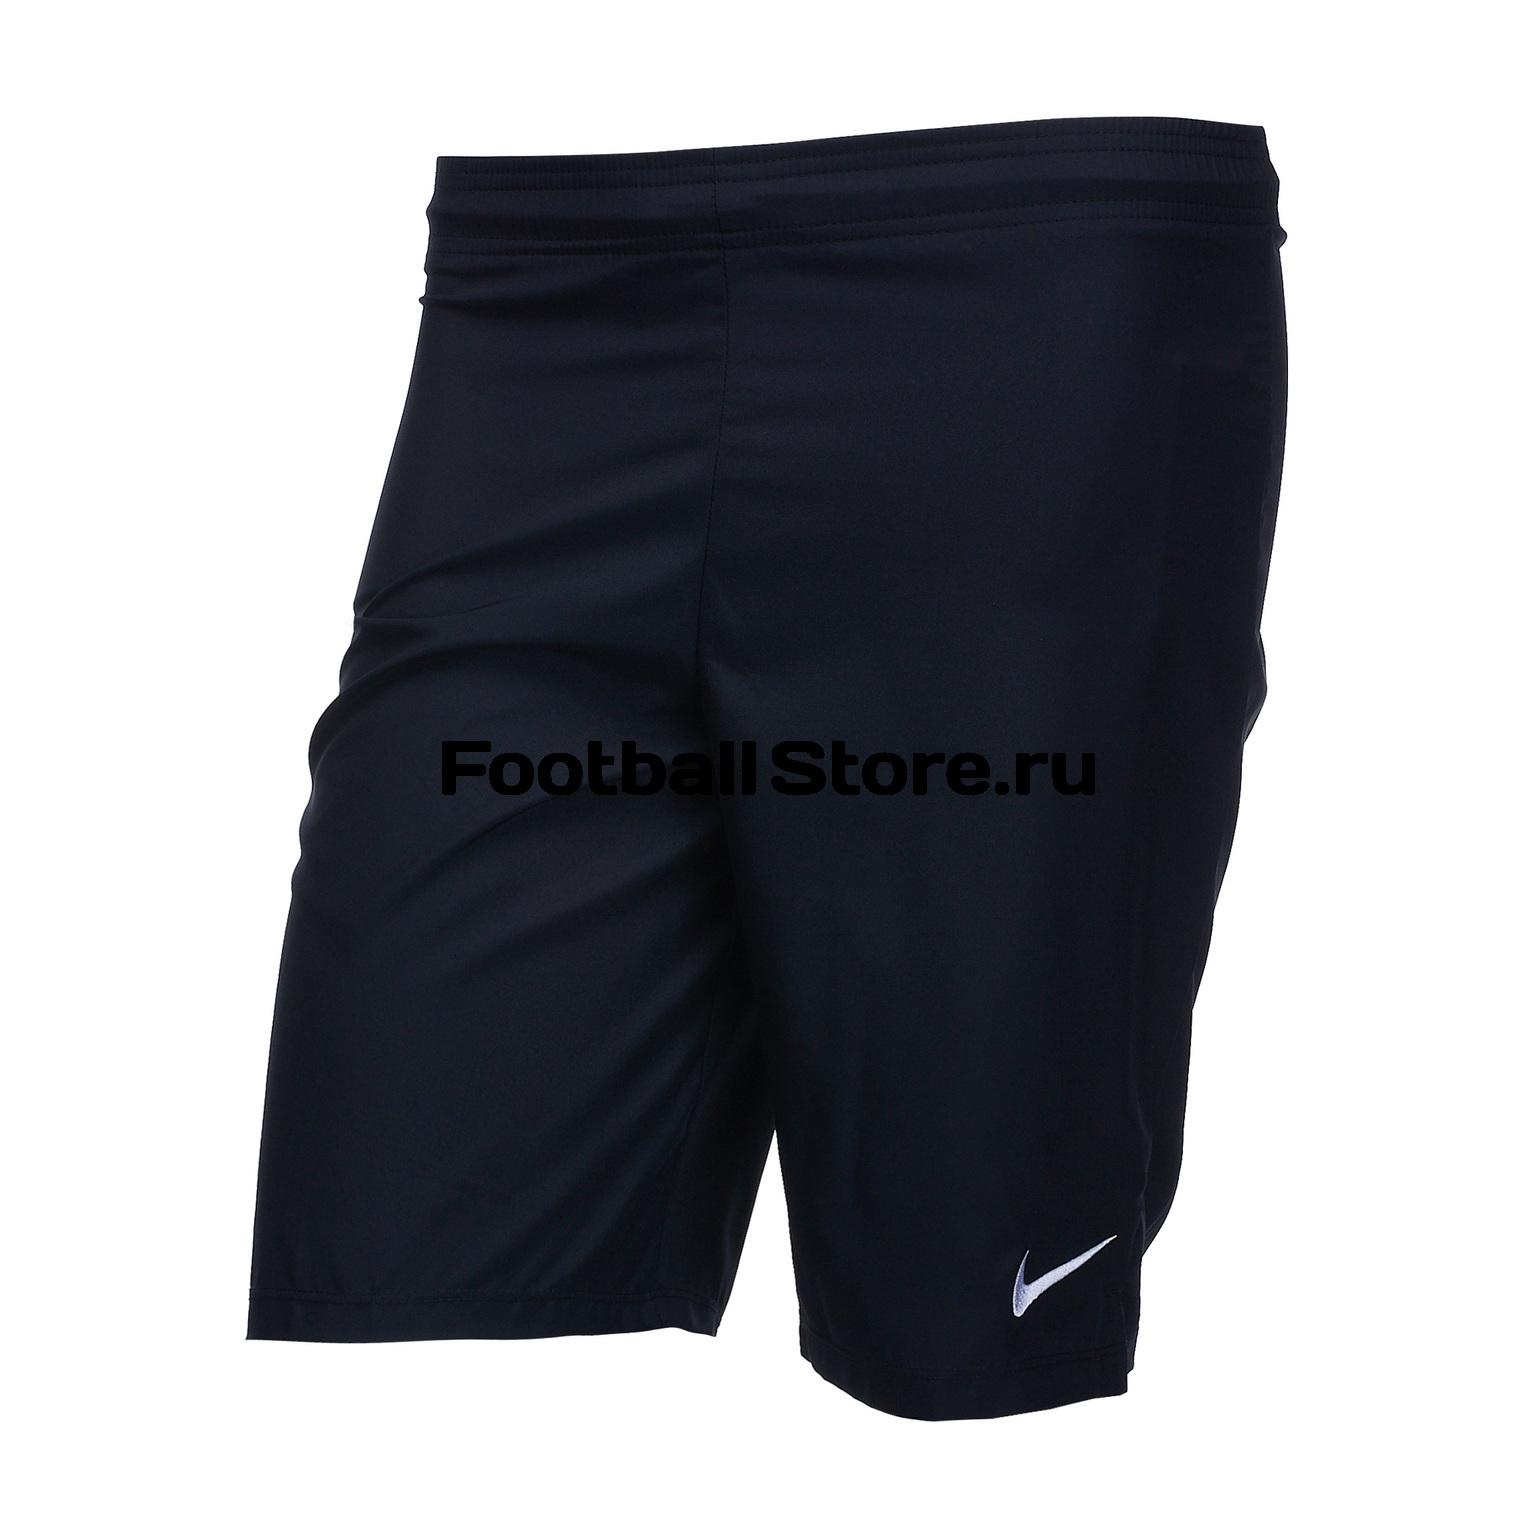 Шорты Nike Laser Woven III Short NB 725901-010 шорты nike laser woven iii short nb 725901 101